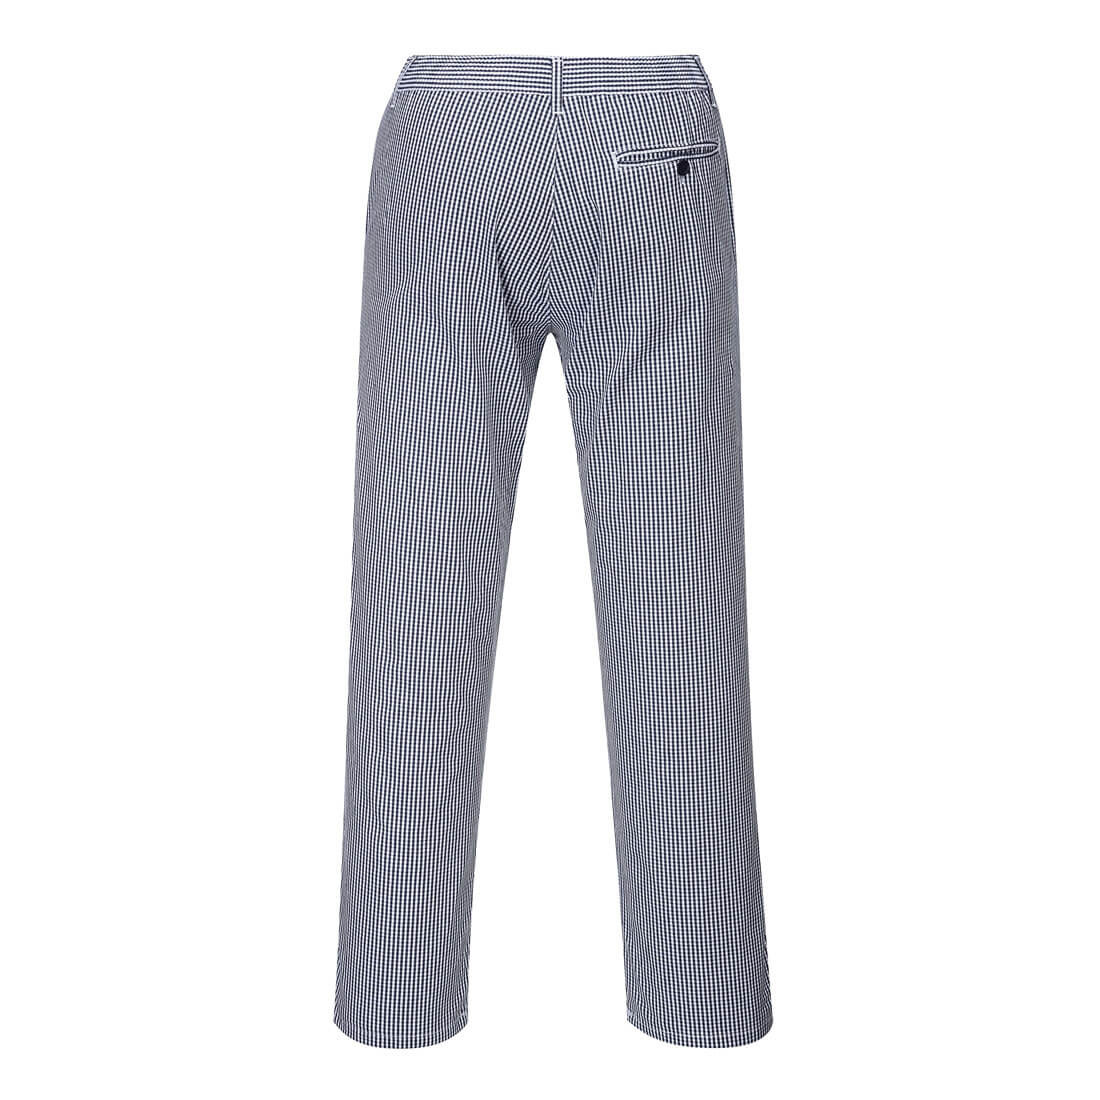 Pantaloni Bucatar Barnet - Imbracaminte de protectie